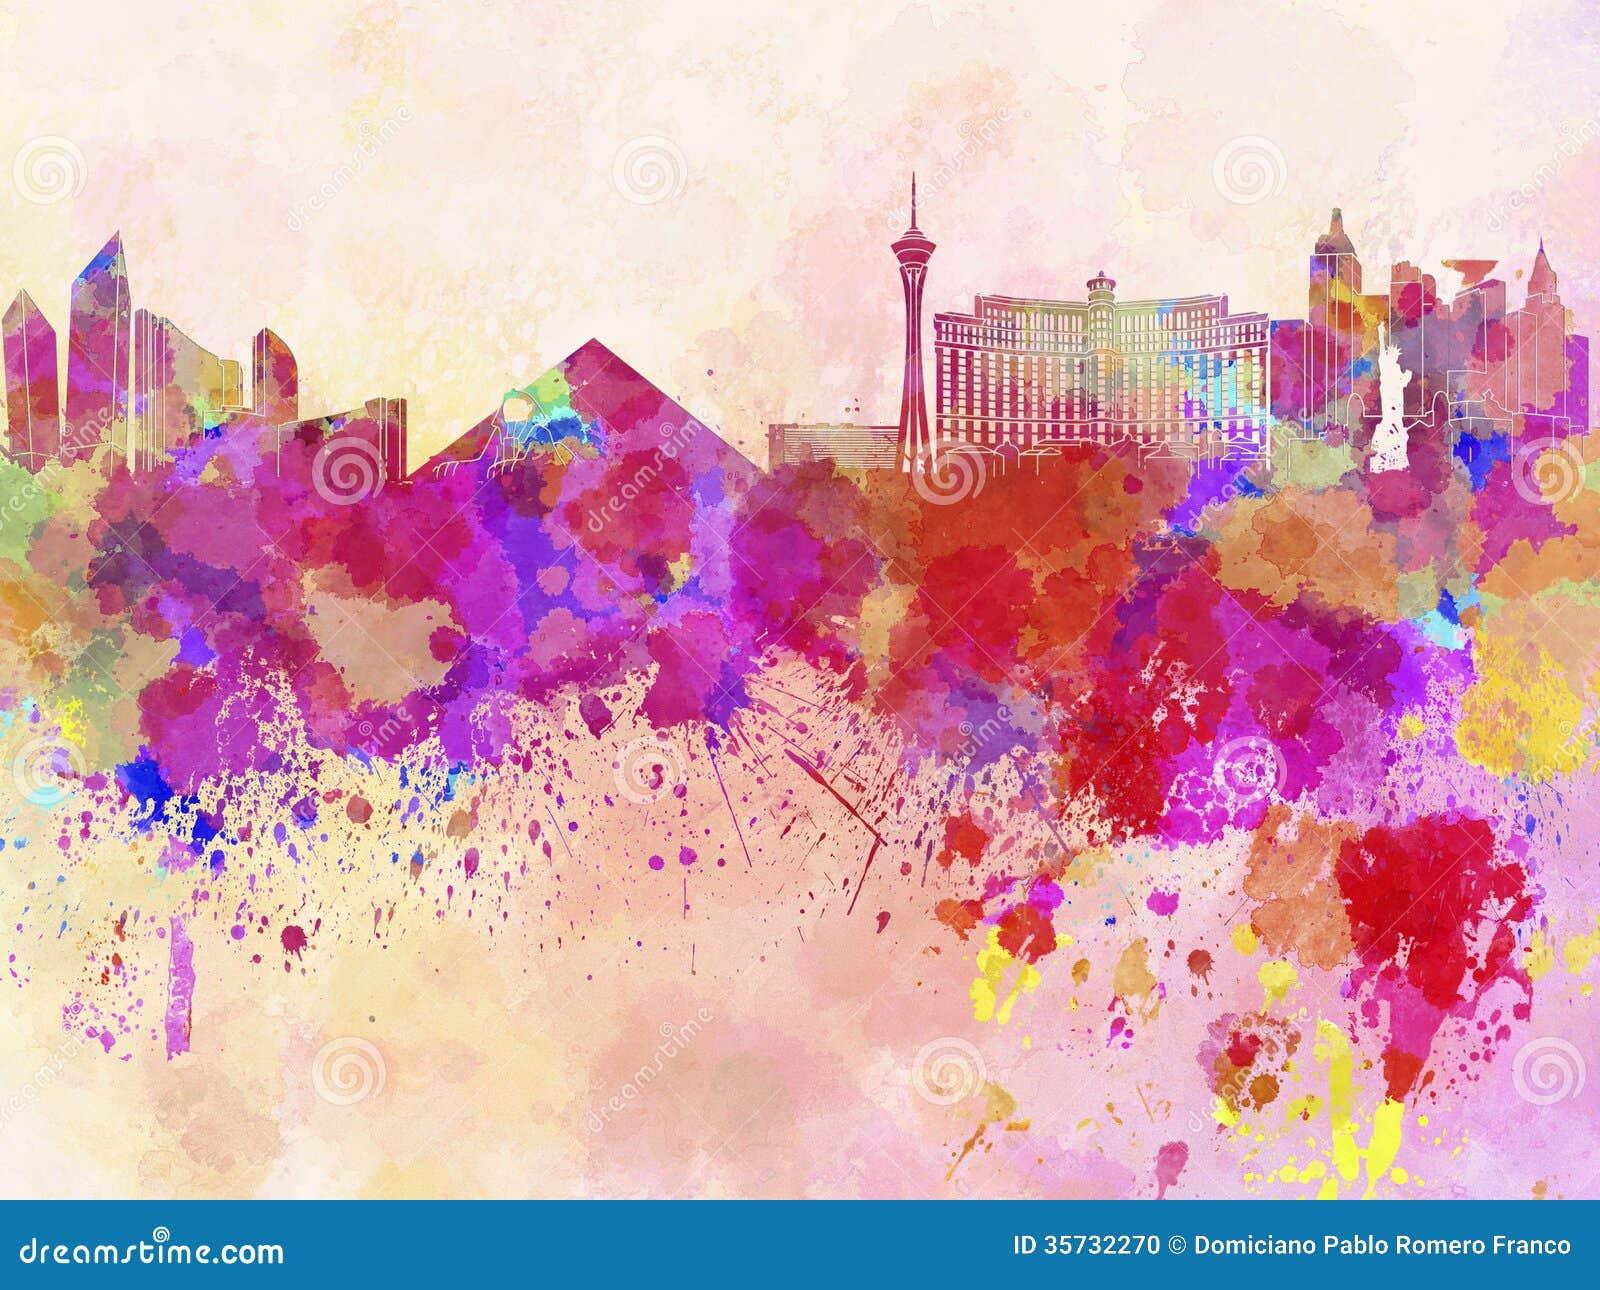 Las Vegas skyline in watercolor background